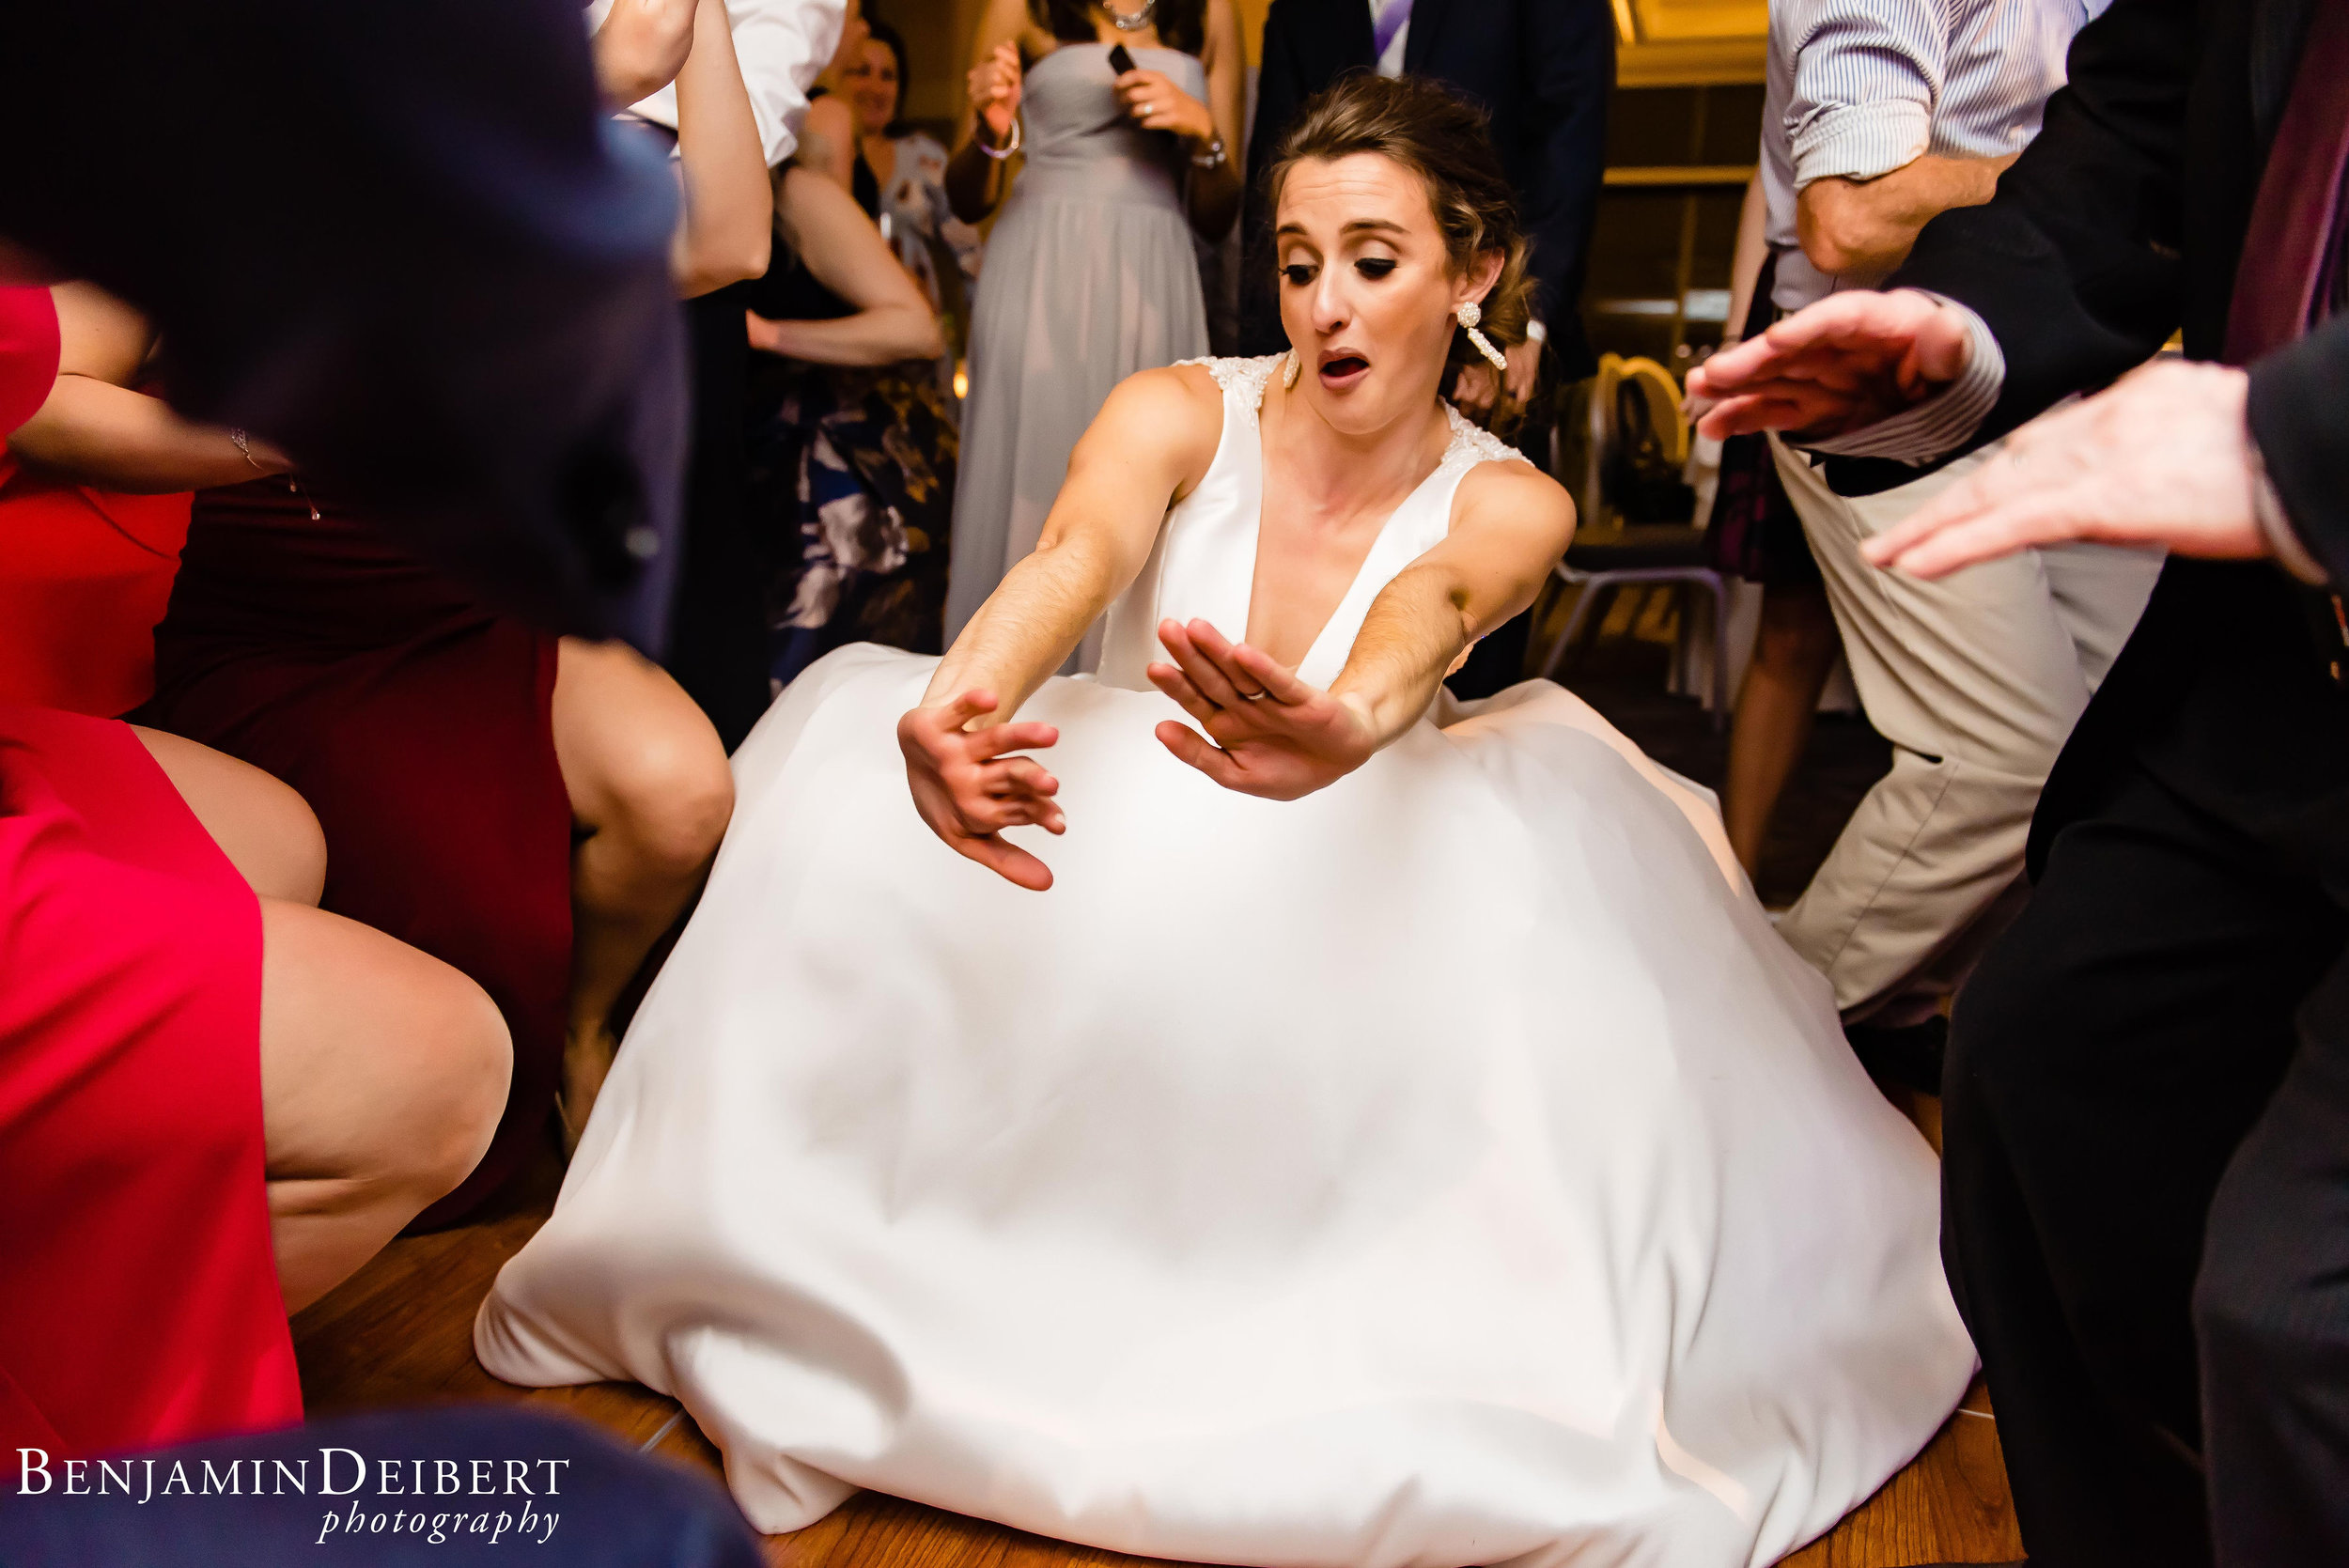 CatherineandDaniel_ThePyramidClub_Wedding-76.jpg